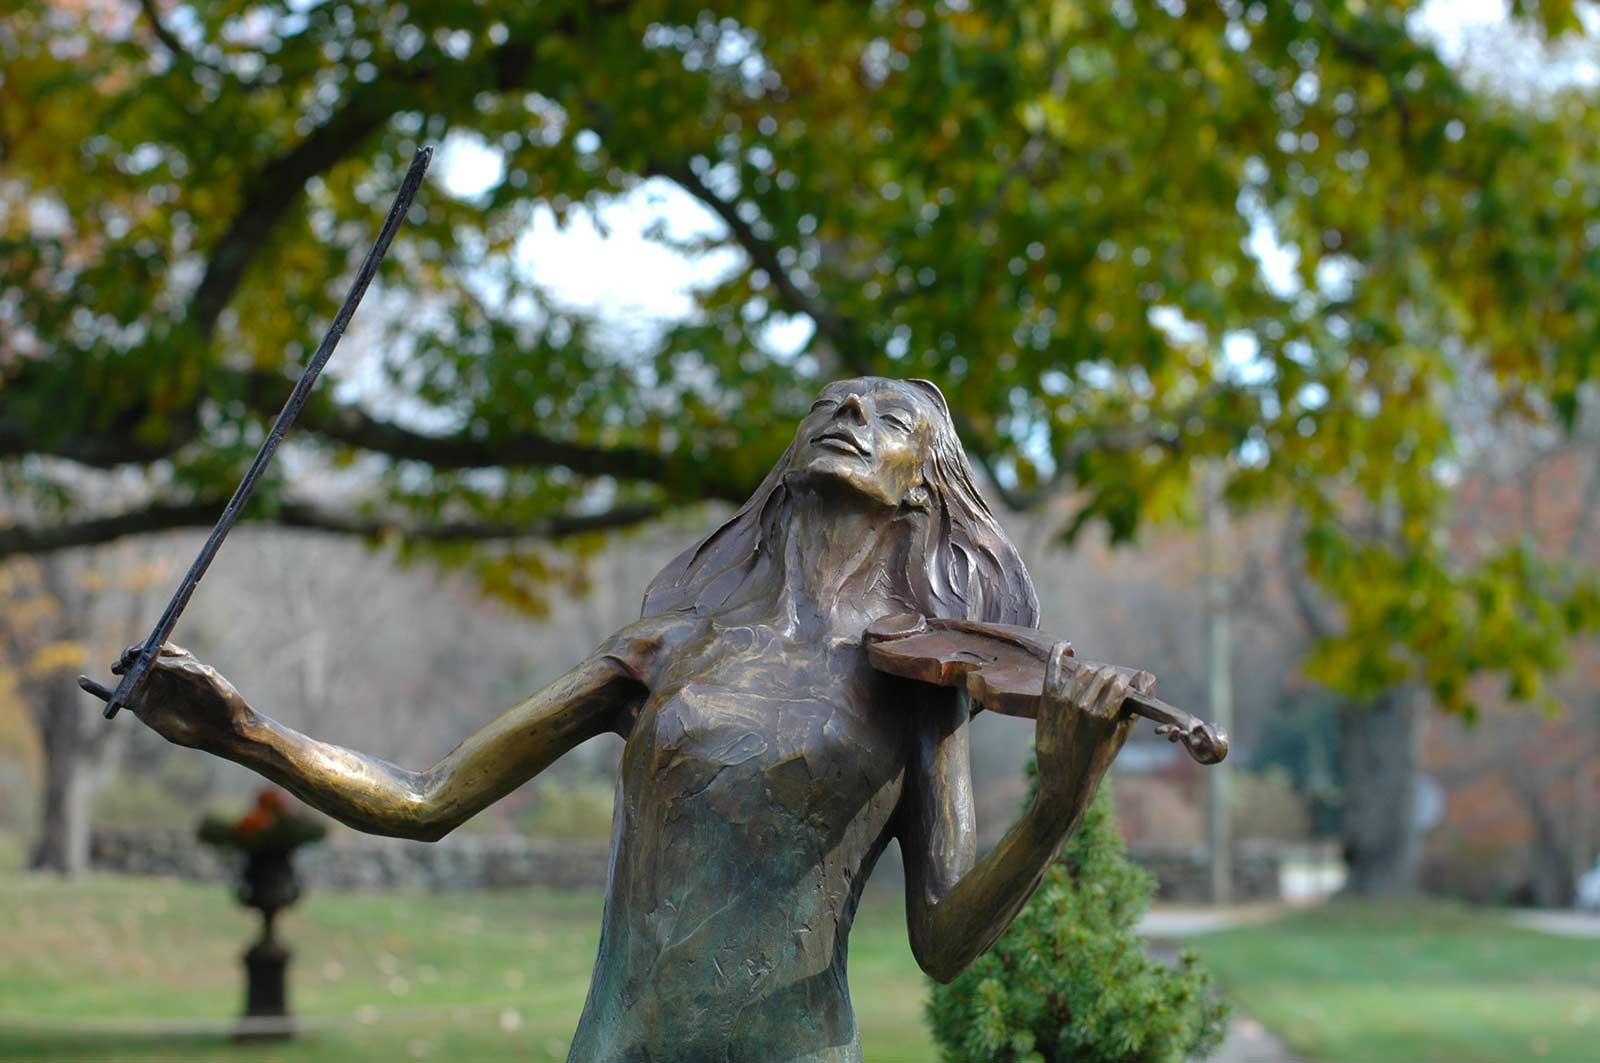 Rapture bronze violinist sculpture by Andrew DeVries